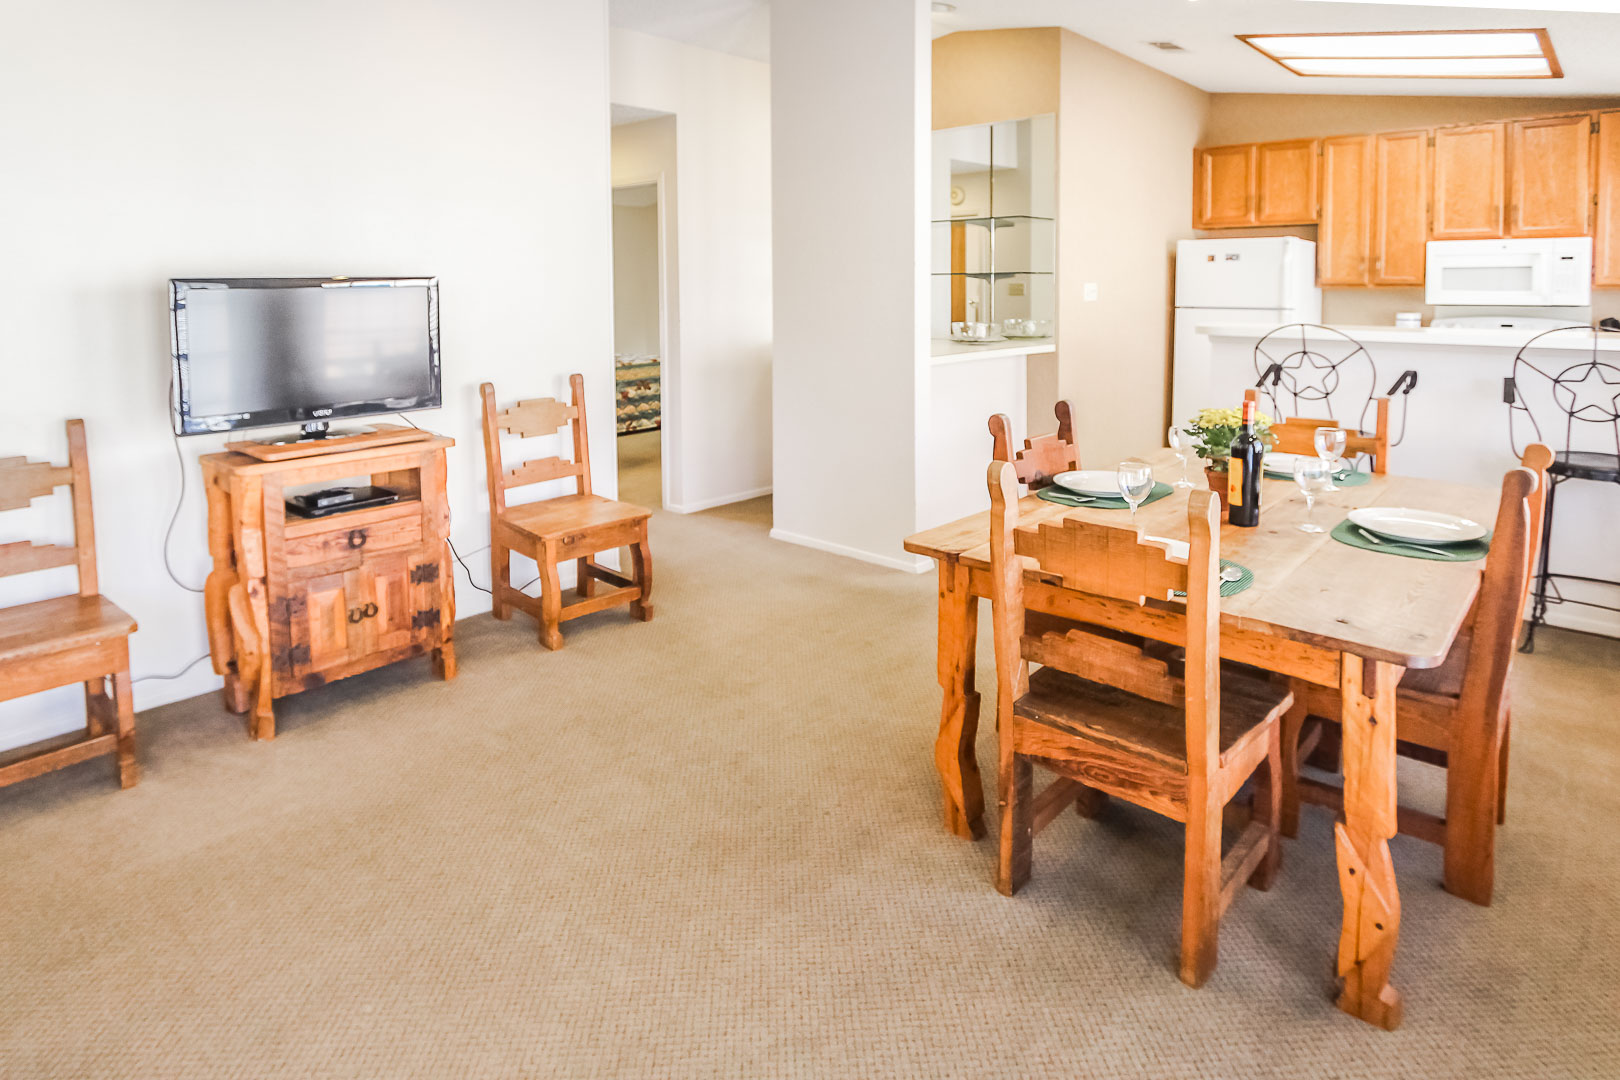 Shores at Lake Travis - Unit Amenities - Living Room